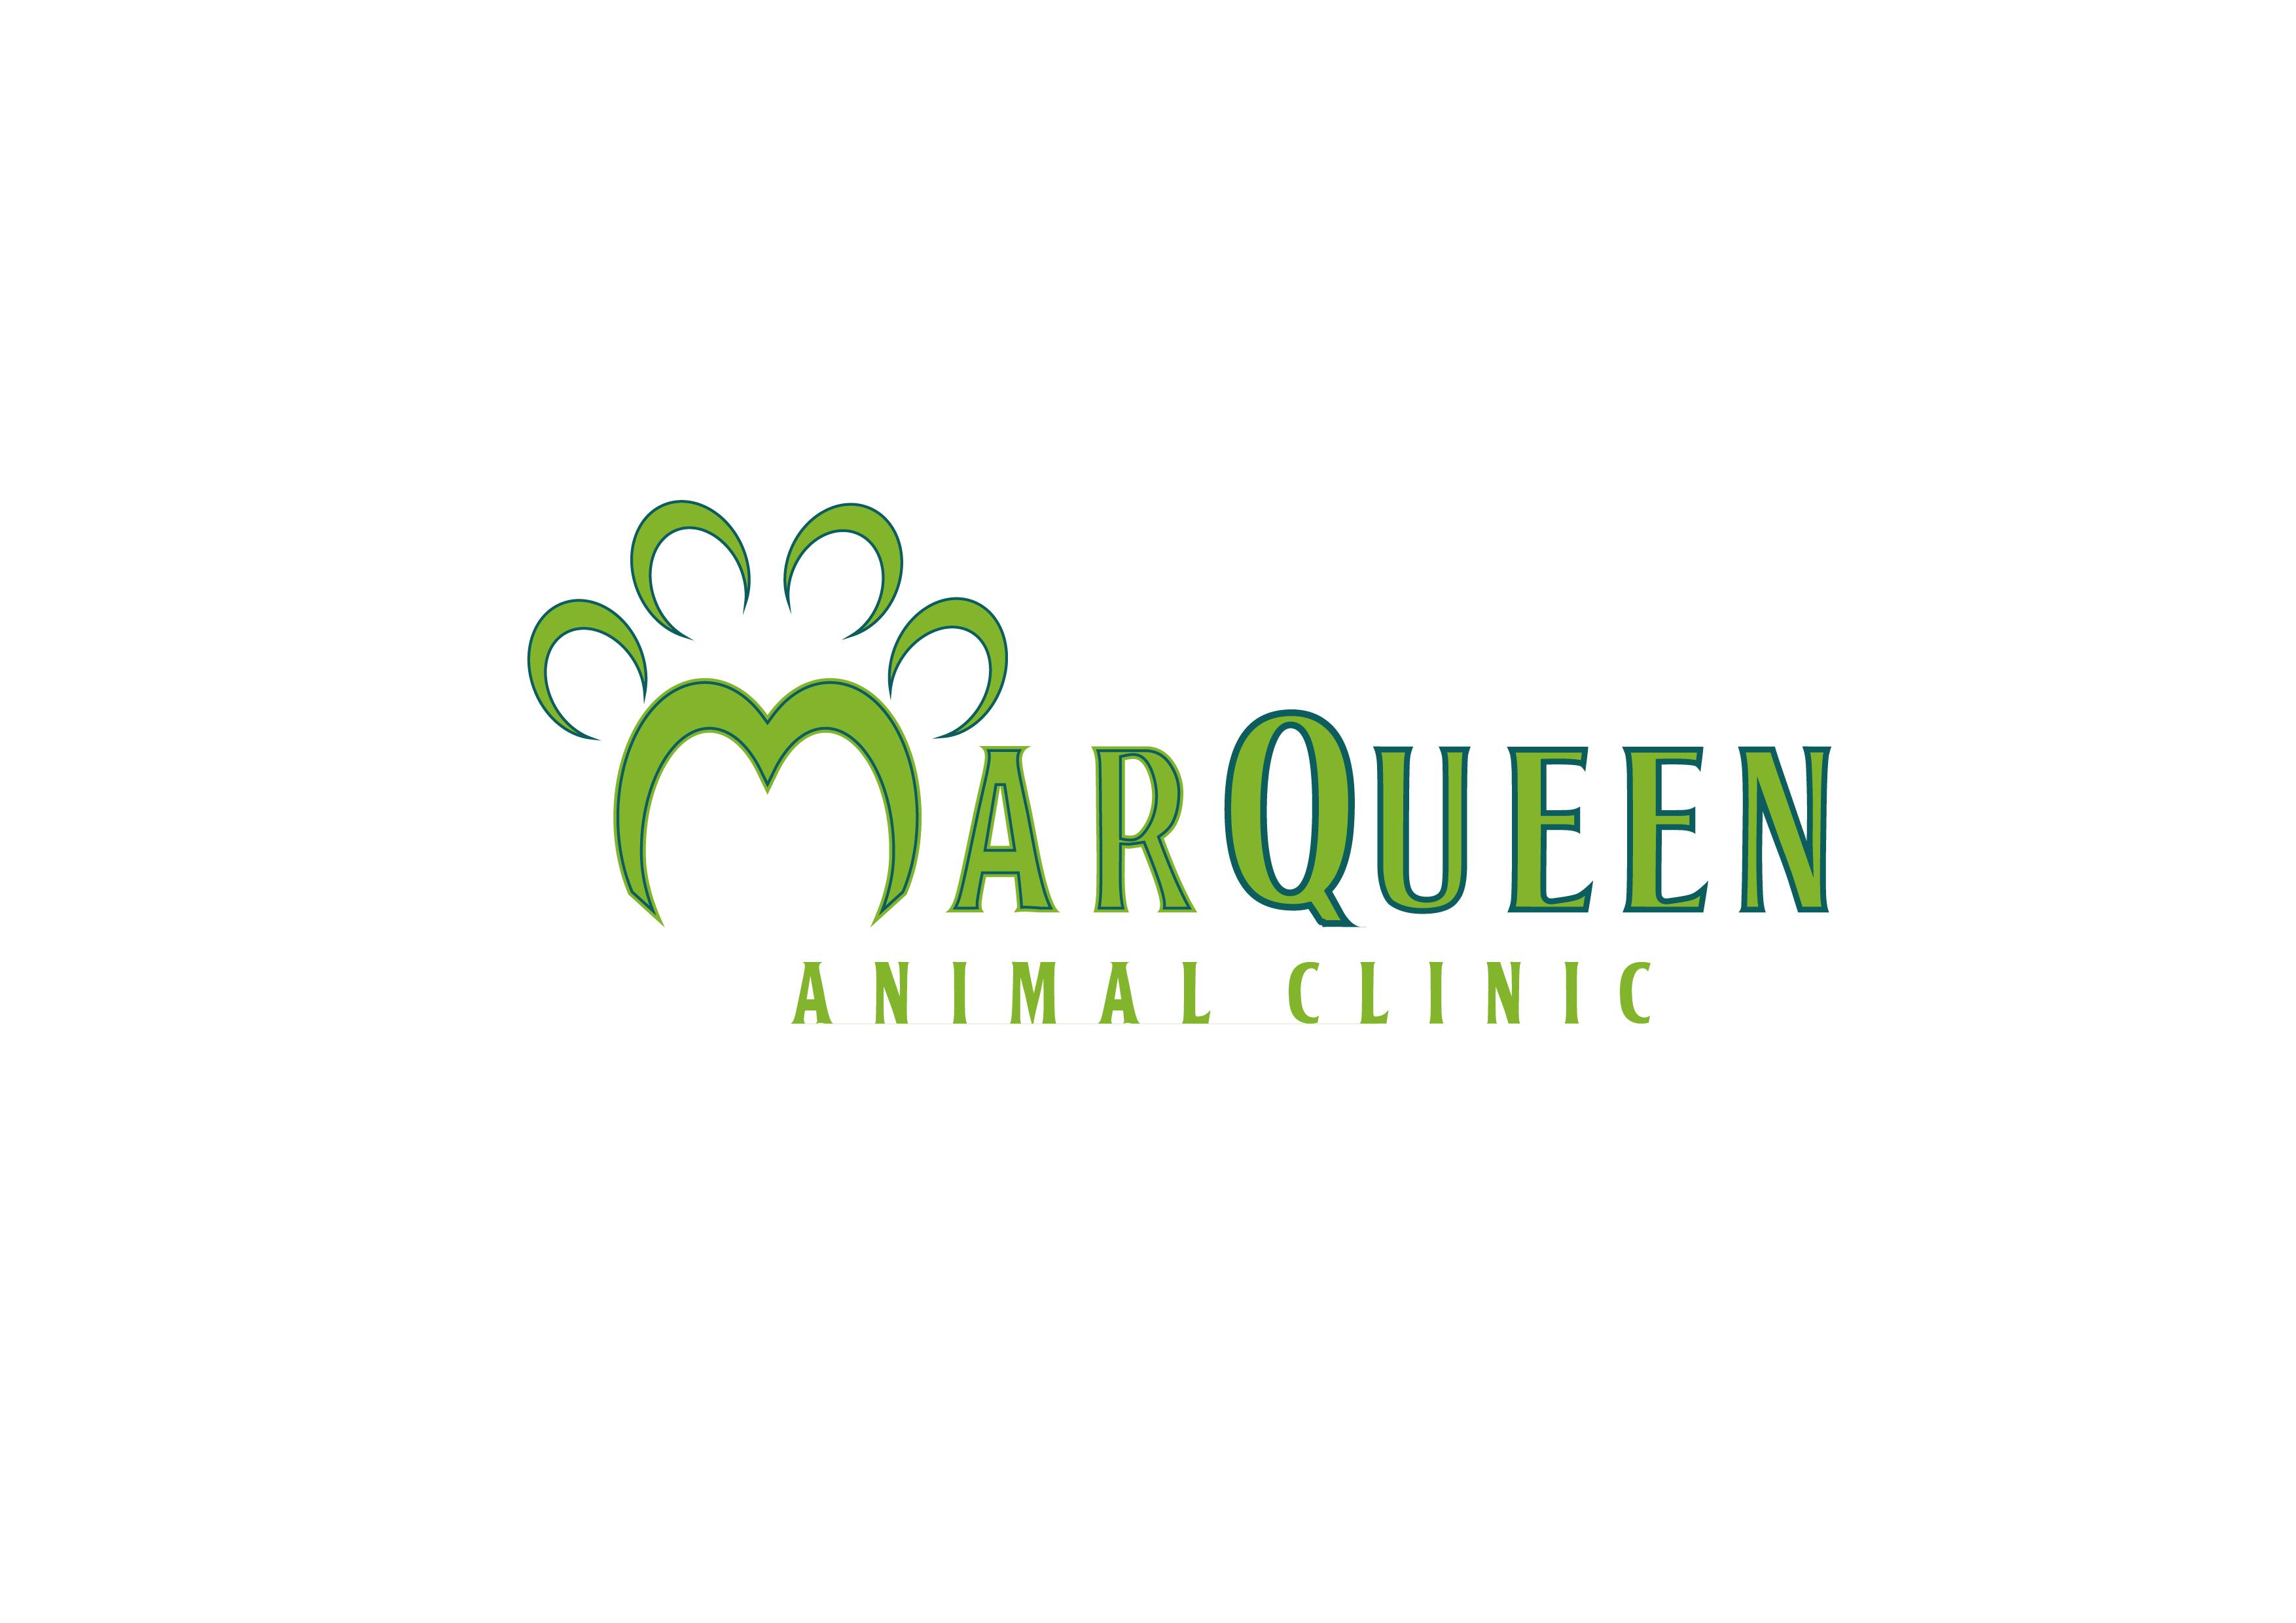 Logo Design by 3draw - Entry No. 101 in the Logo Design Contest Fun Logo Design for MarQueen Animal Clinic.